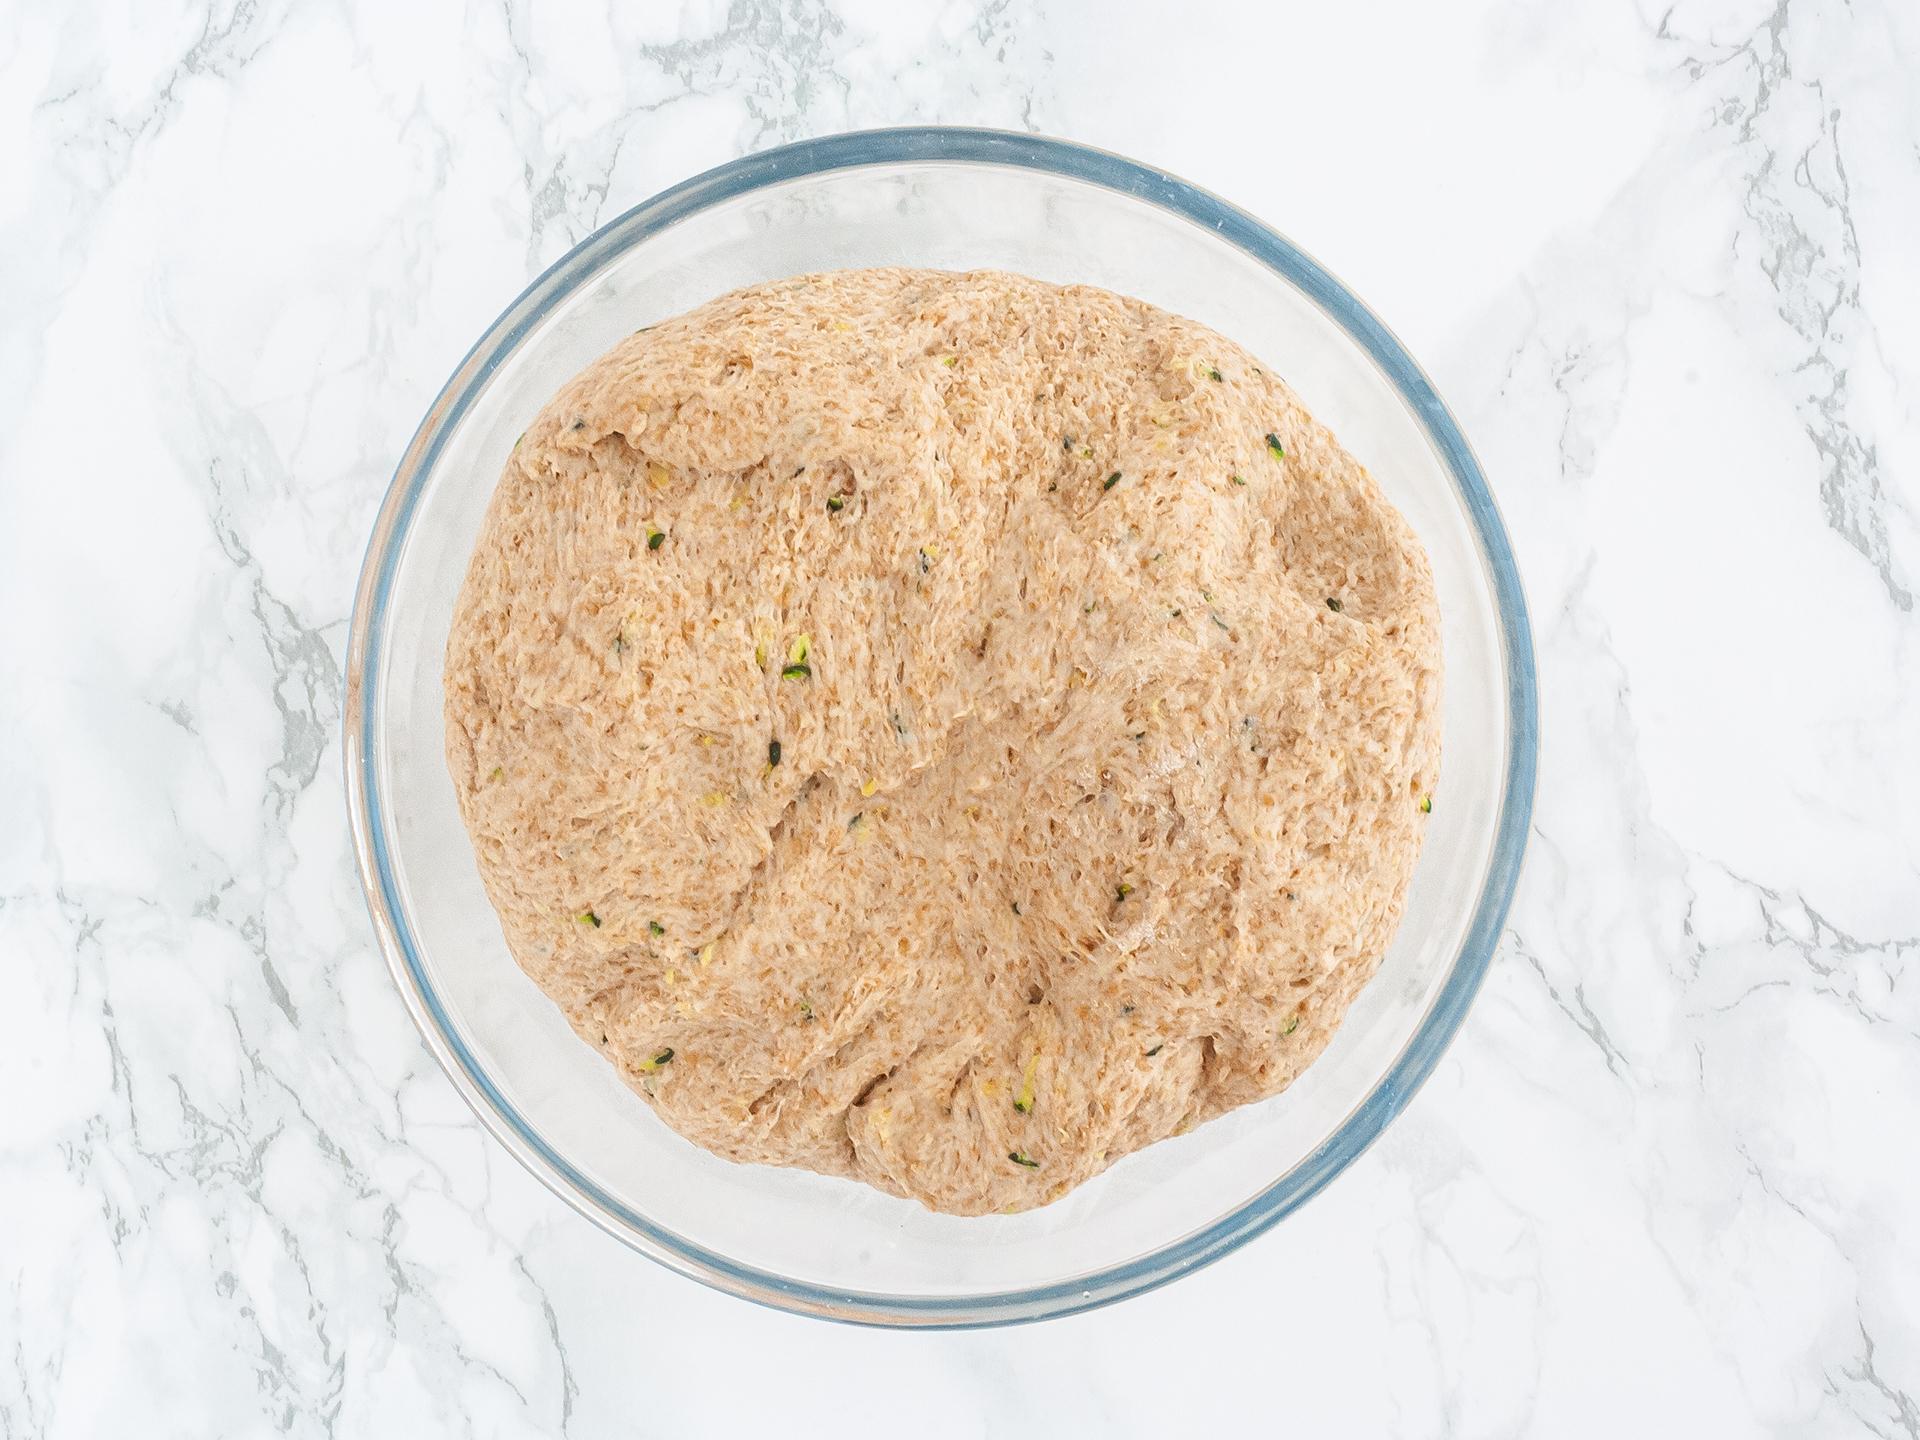 Step 2.1 of Zucchini Garlic Bread Recipe